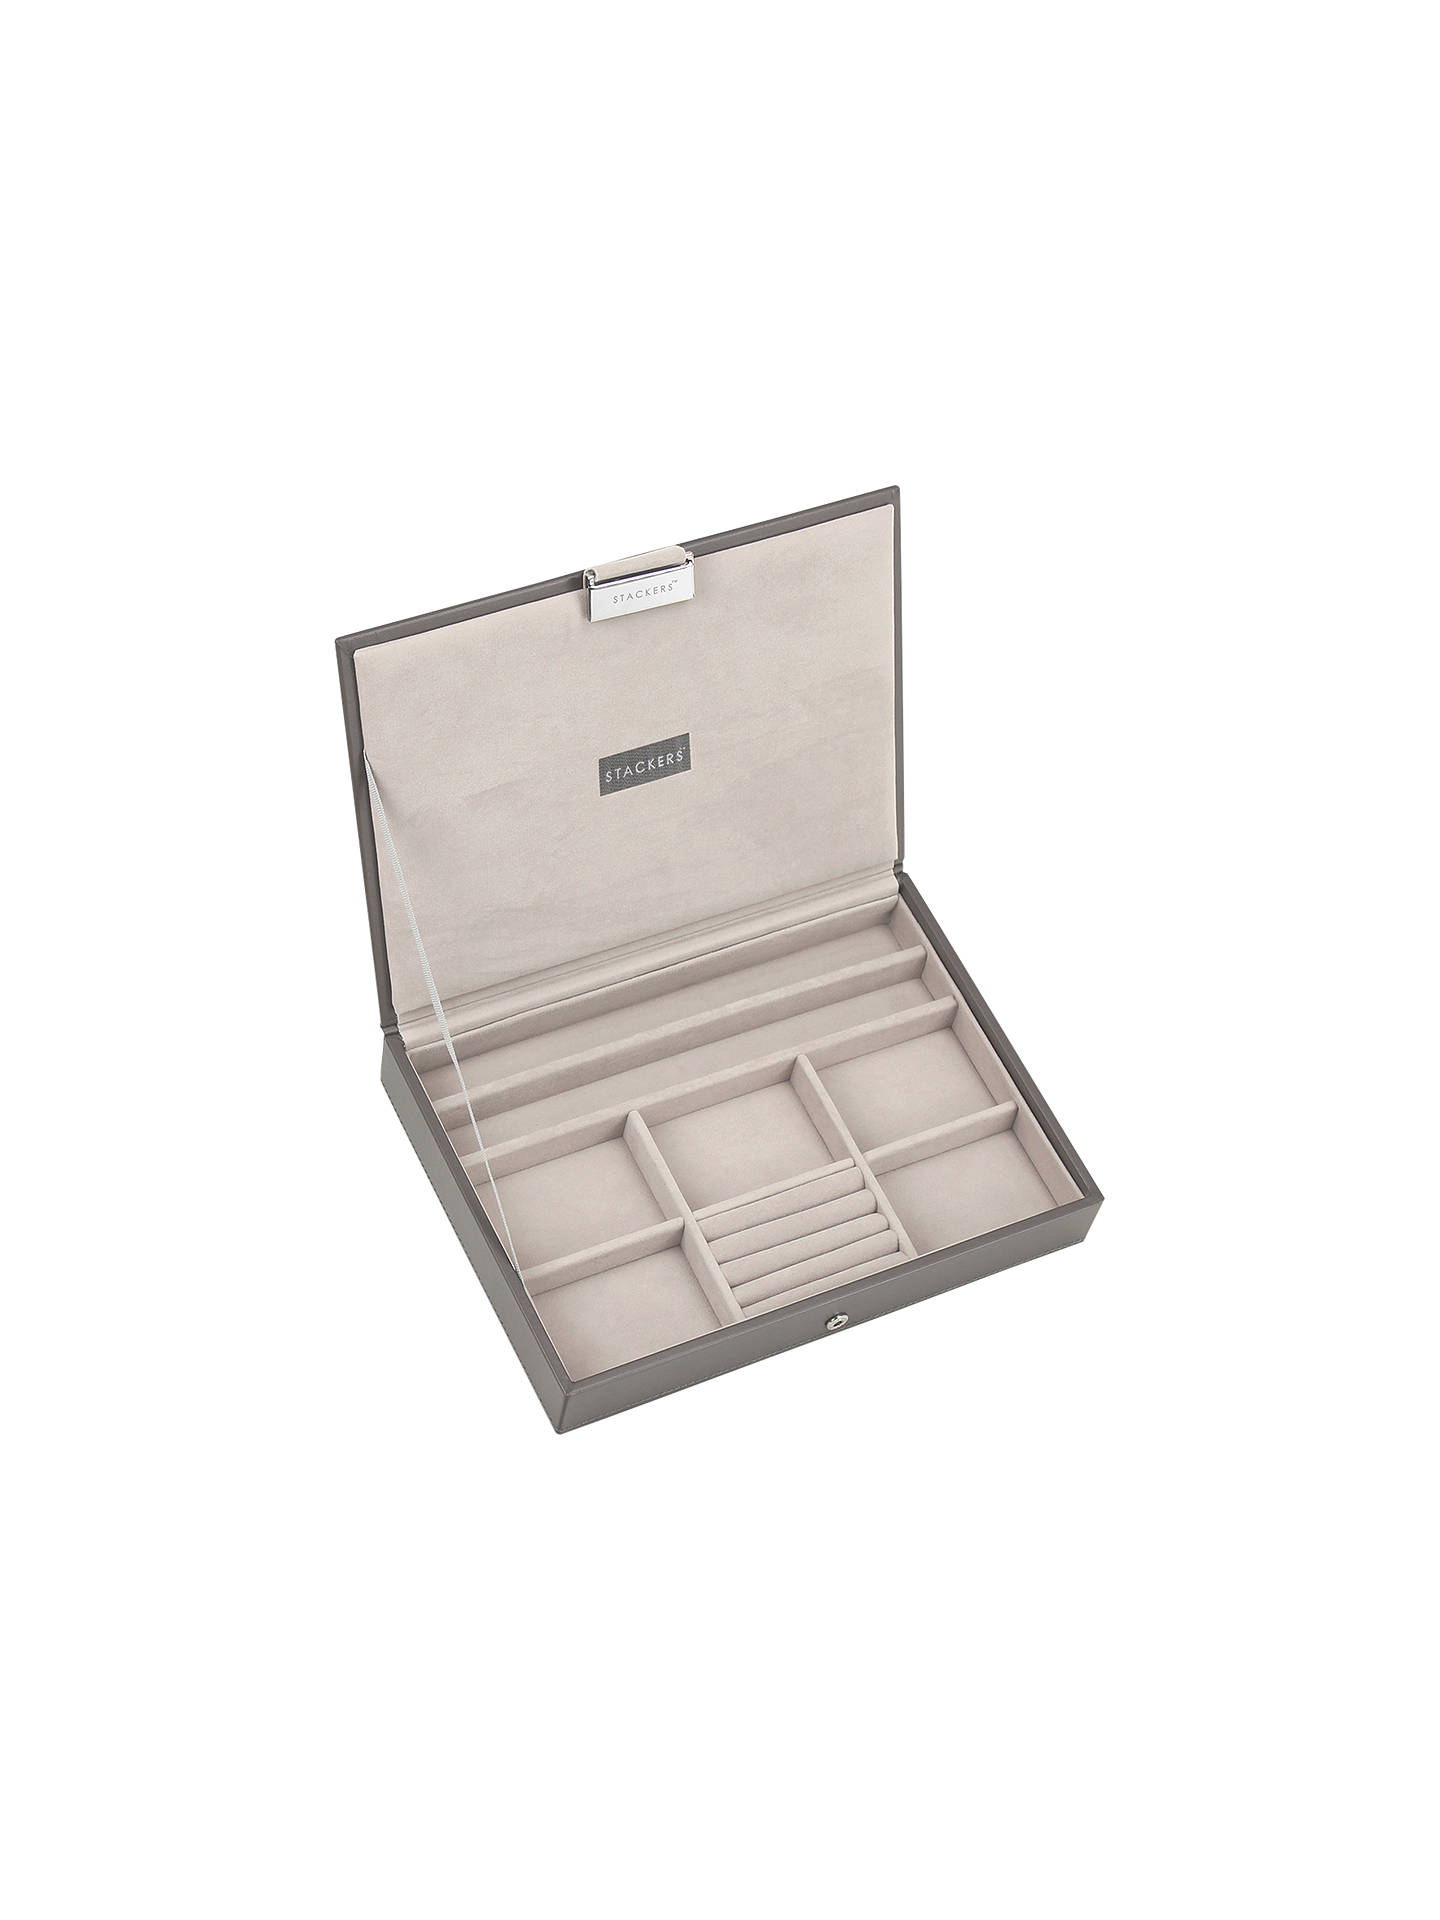 c2cb7fb9b Buy Stackers Jewellery Box Lid, Mink Online at johnlewis.com ...